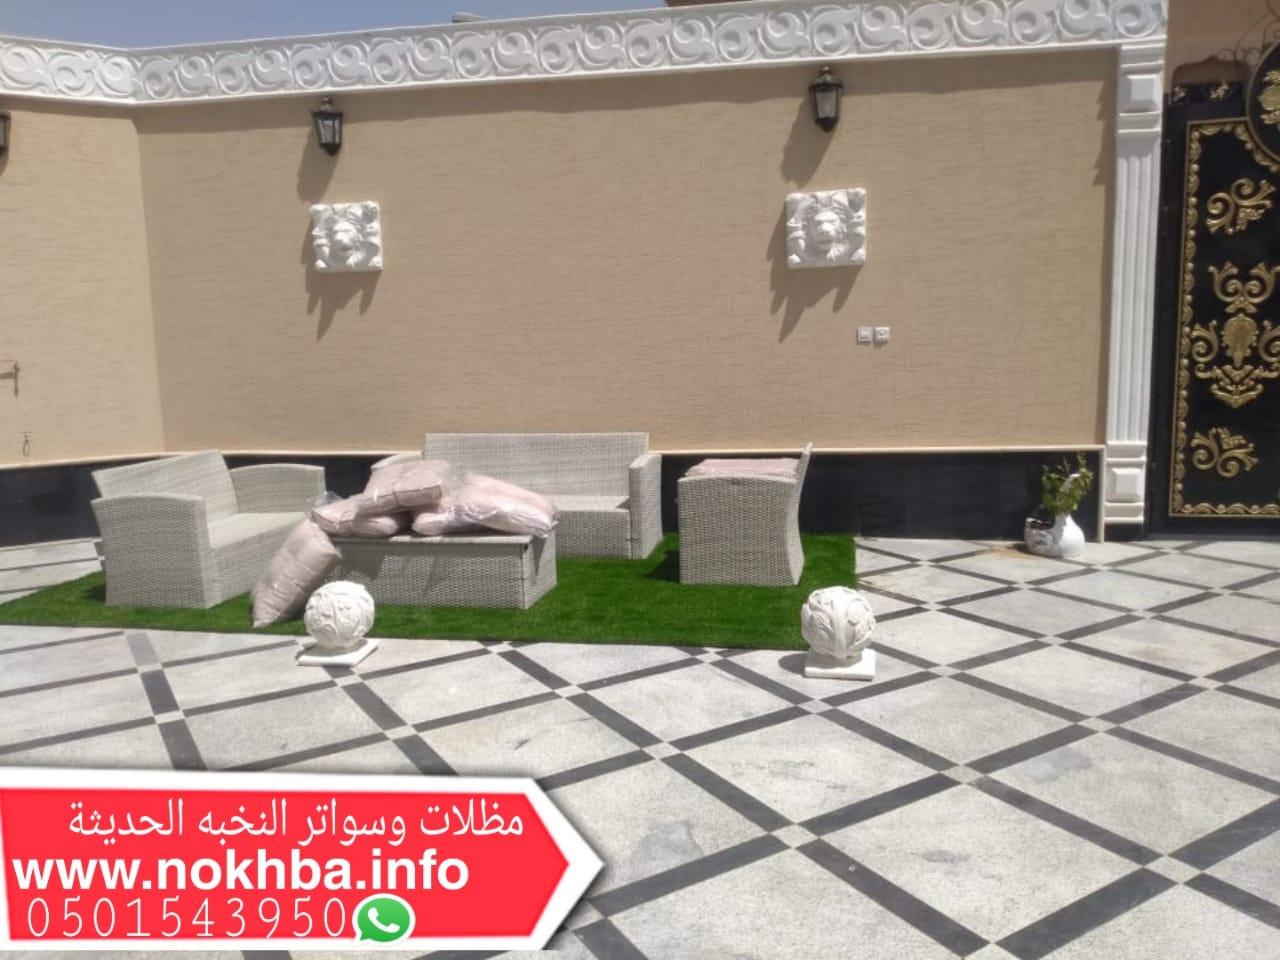 تنسيق حدائق , تنسيق حدائق 0501543950  P_1705aww9m7